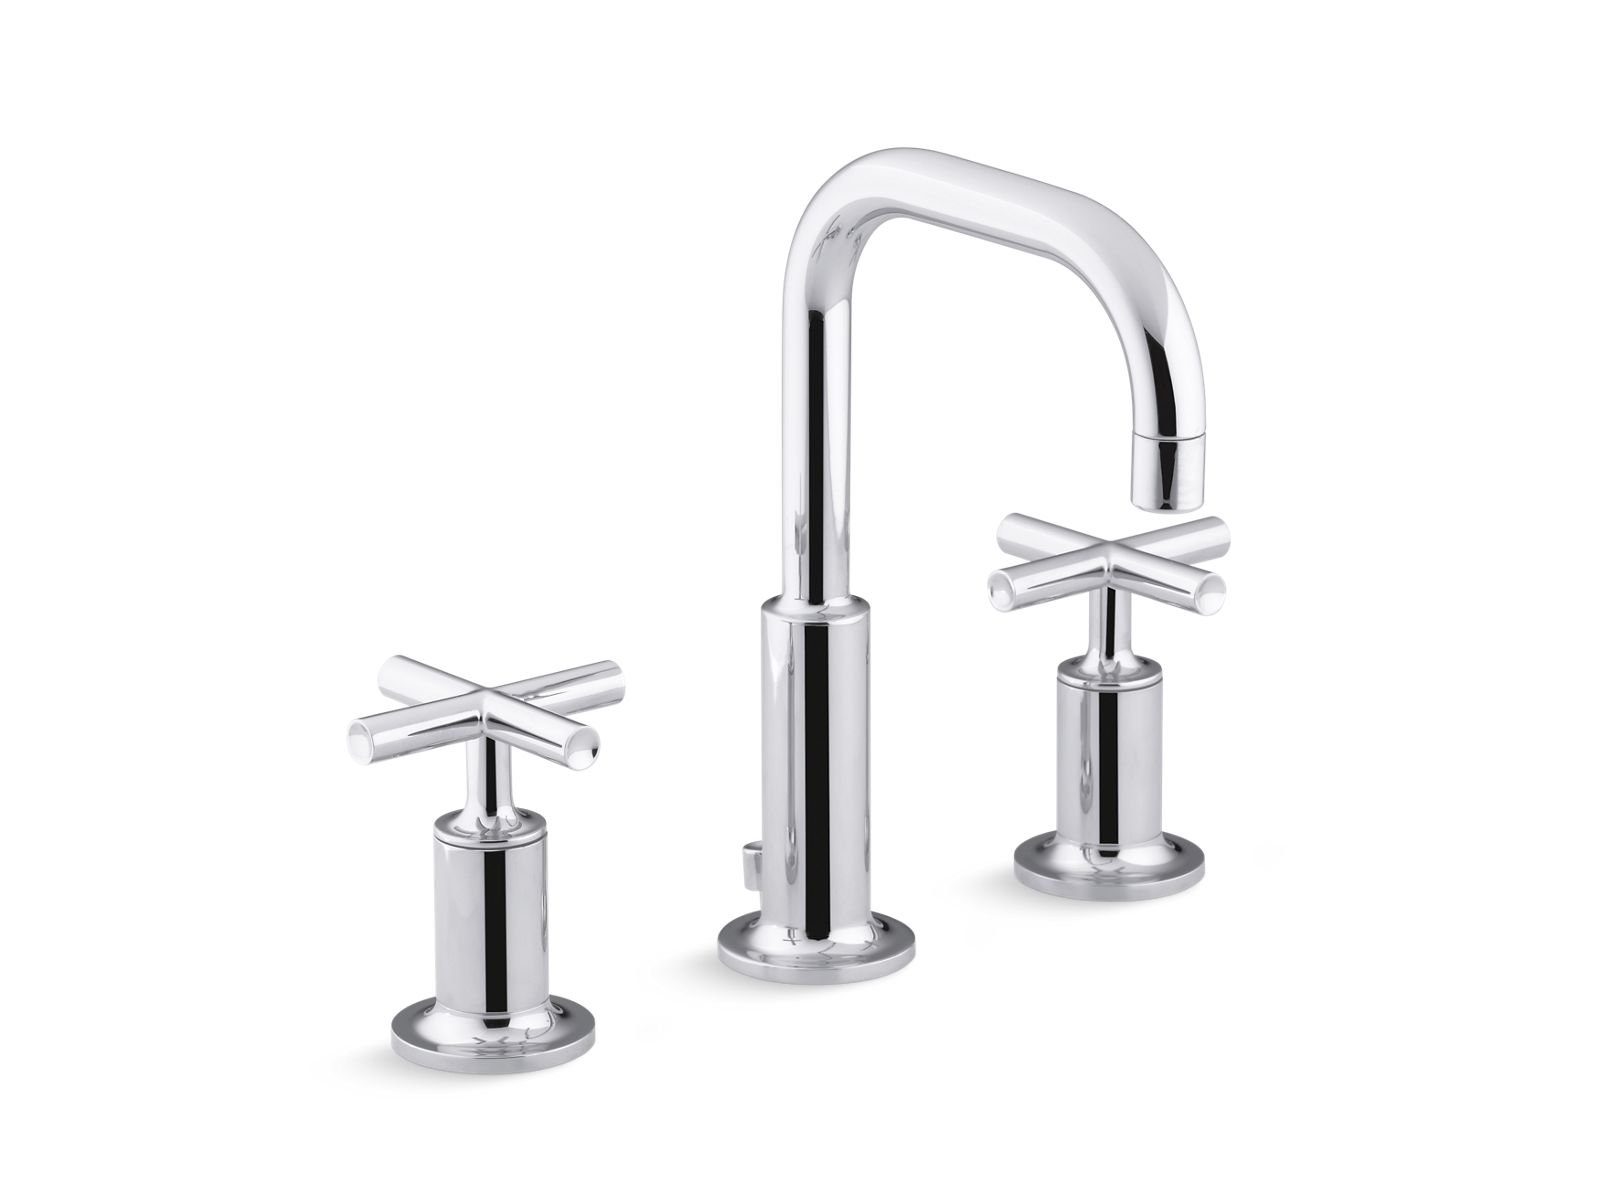 k 14406 3 purist widespread sink faucet with low cross handles kohler